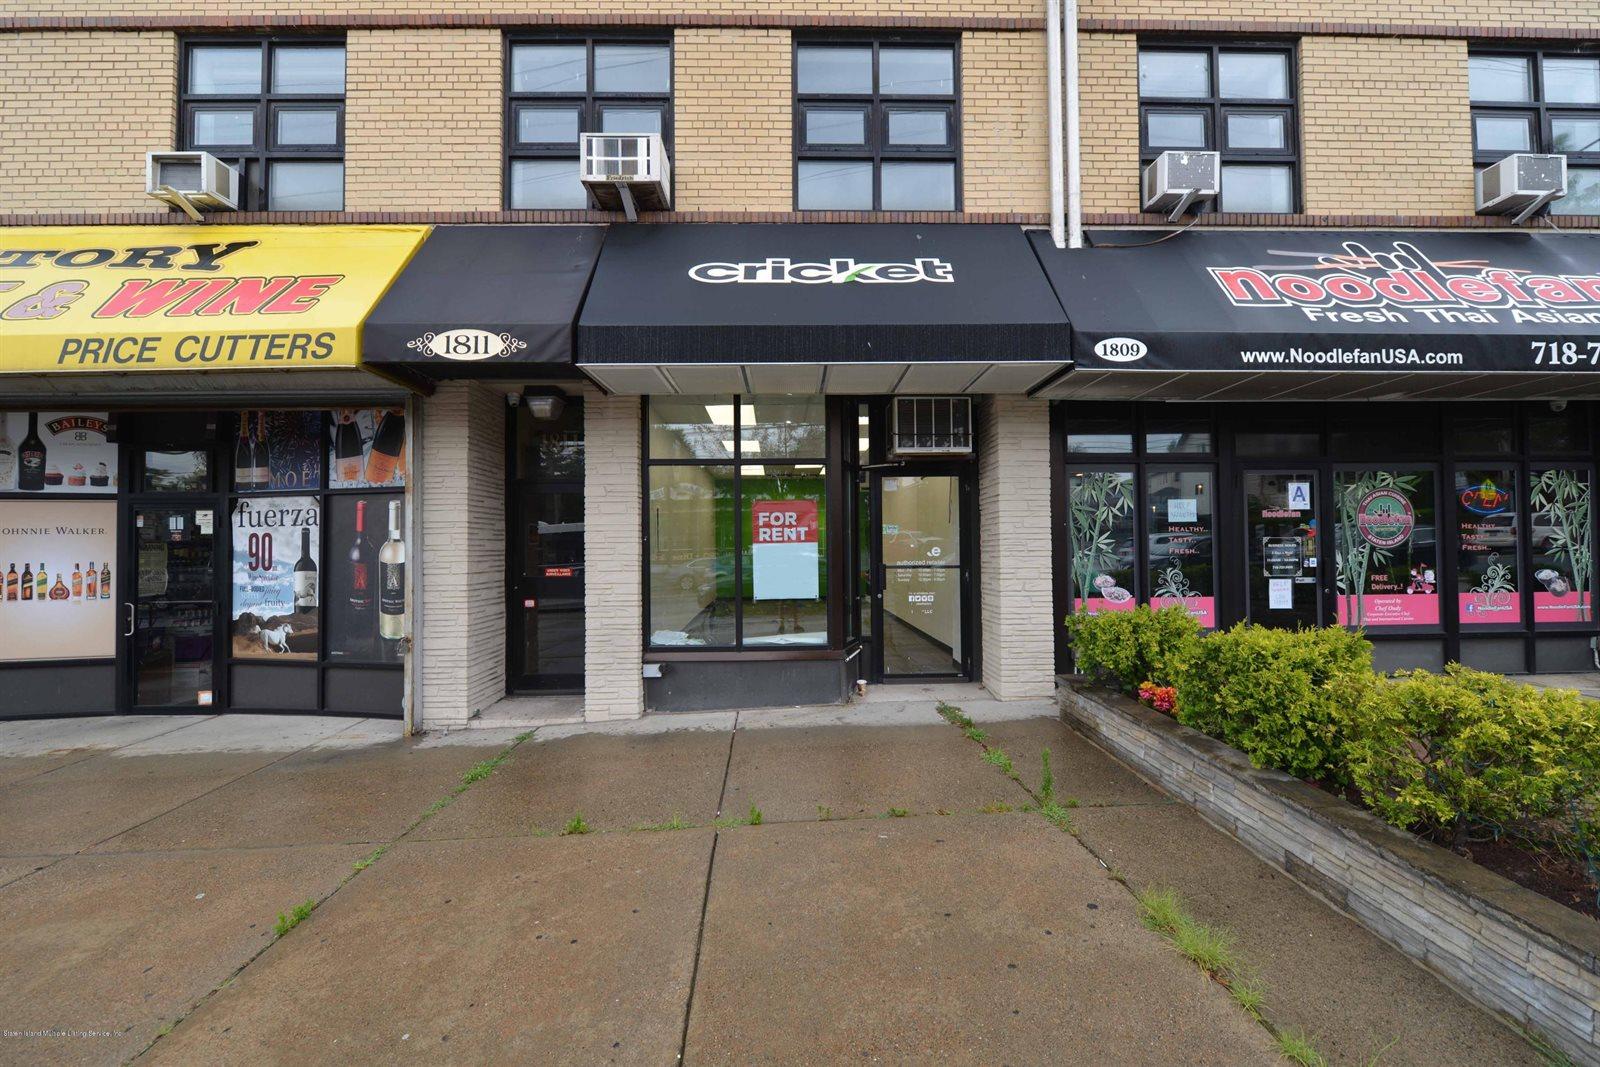 1811 Victory Boulevard, #1, Staten Island, NY 10314